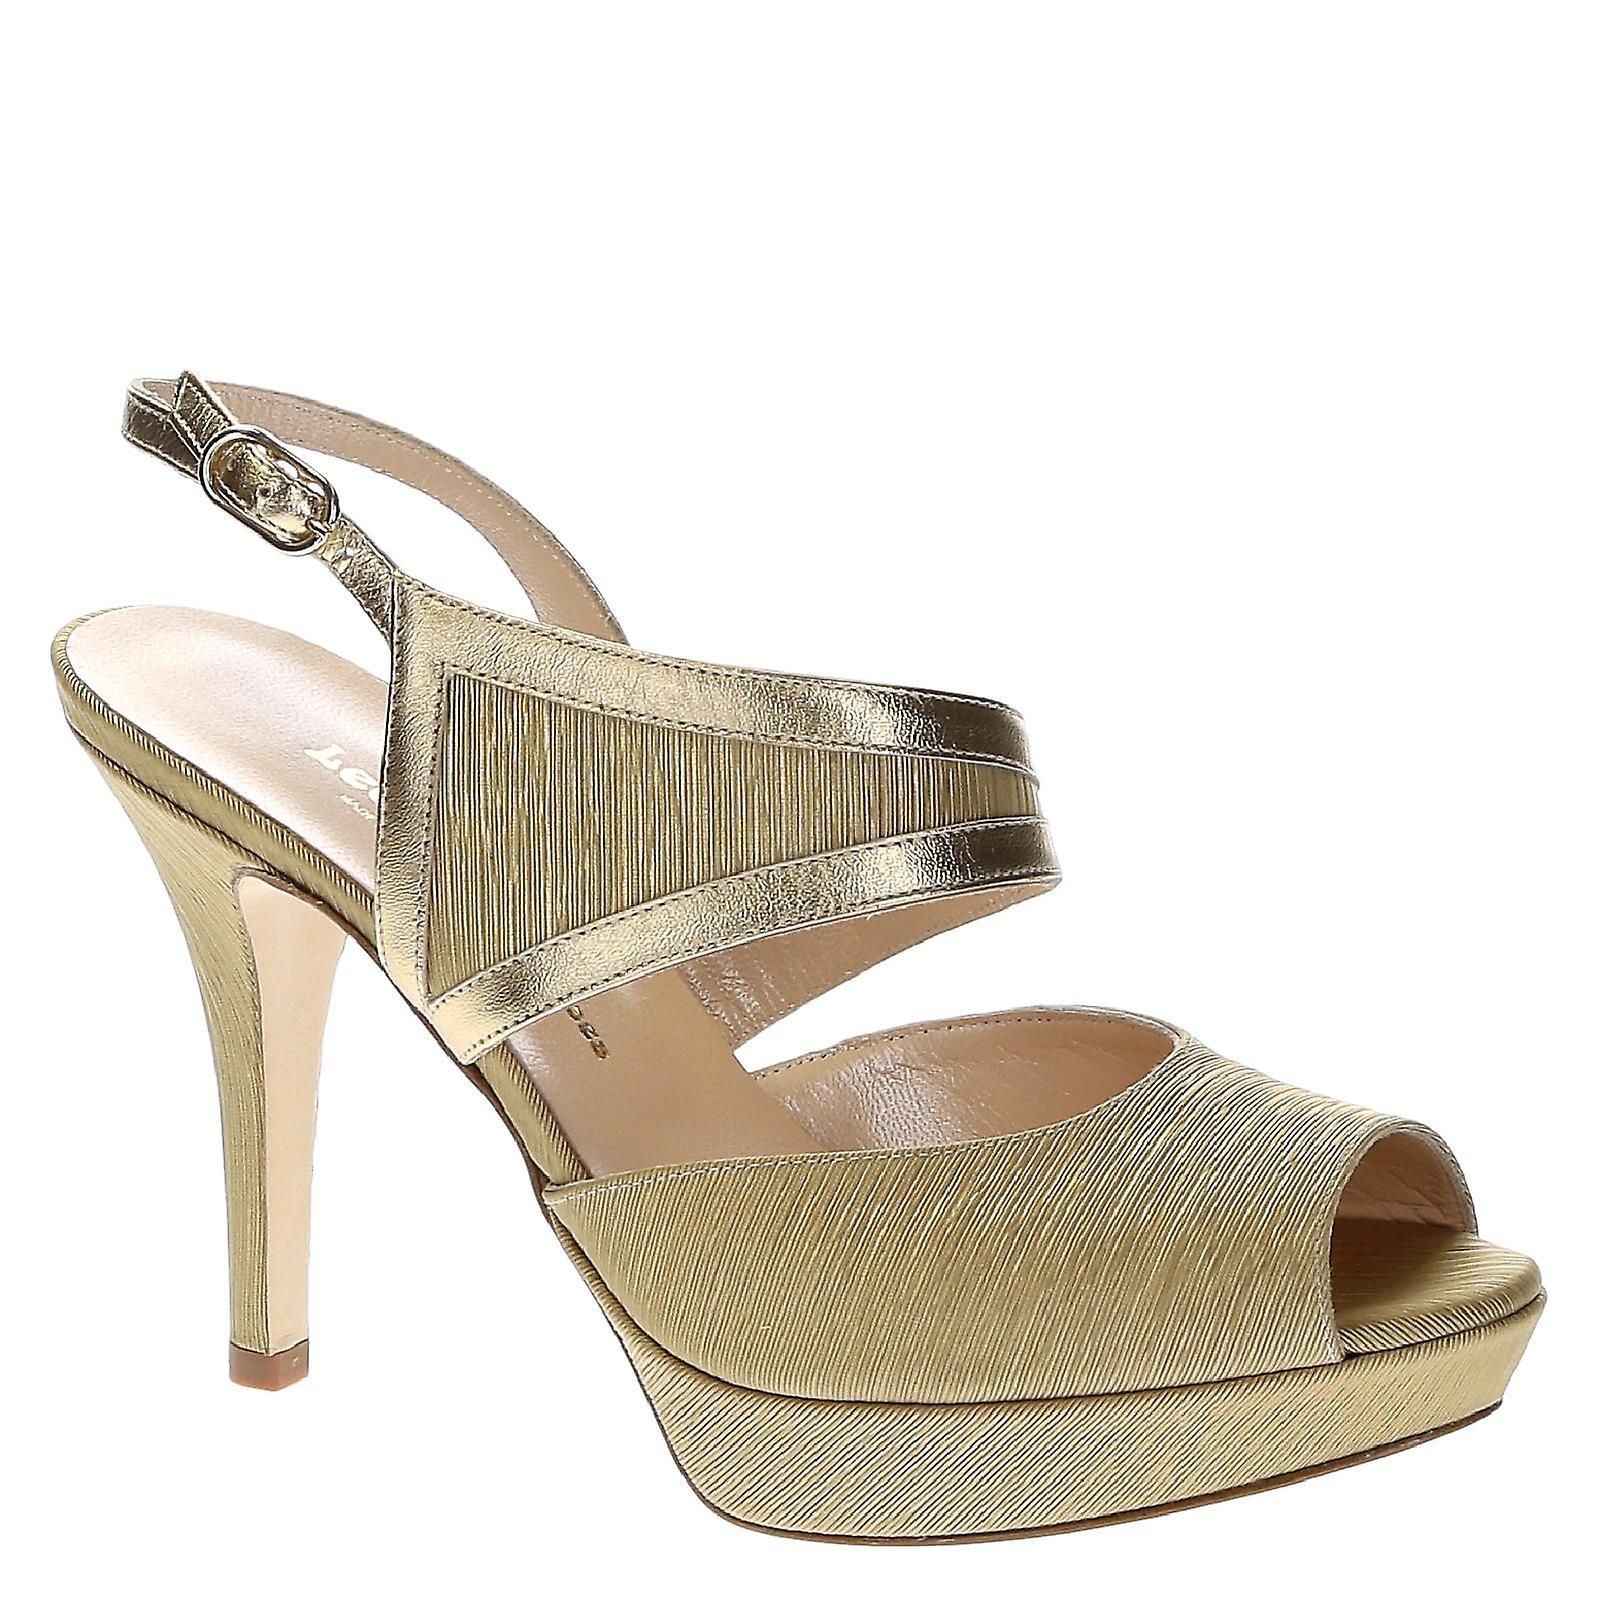 Platform in sandals in Platform platinum leather and satin 57f7a8